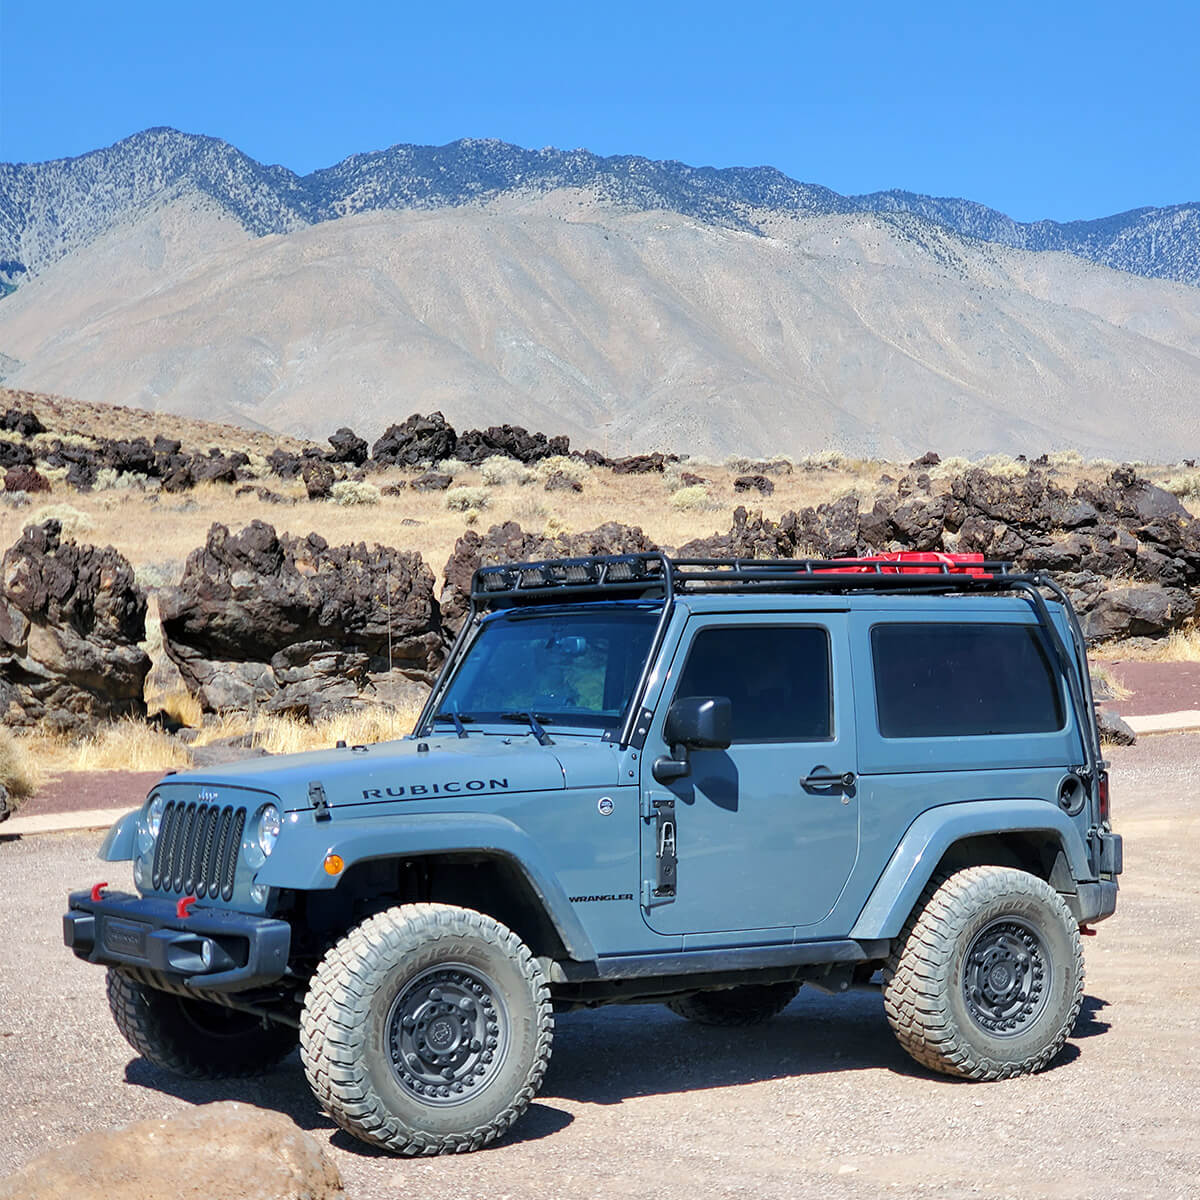 Jeep Wrangler JK Rubicon Gobi stealth roof rack